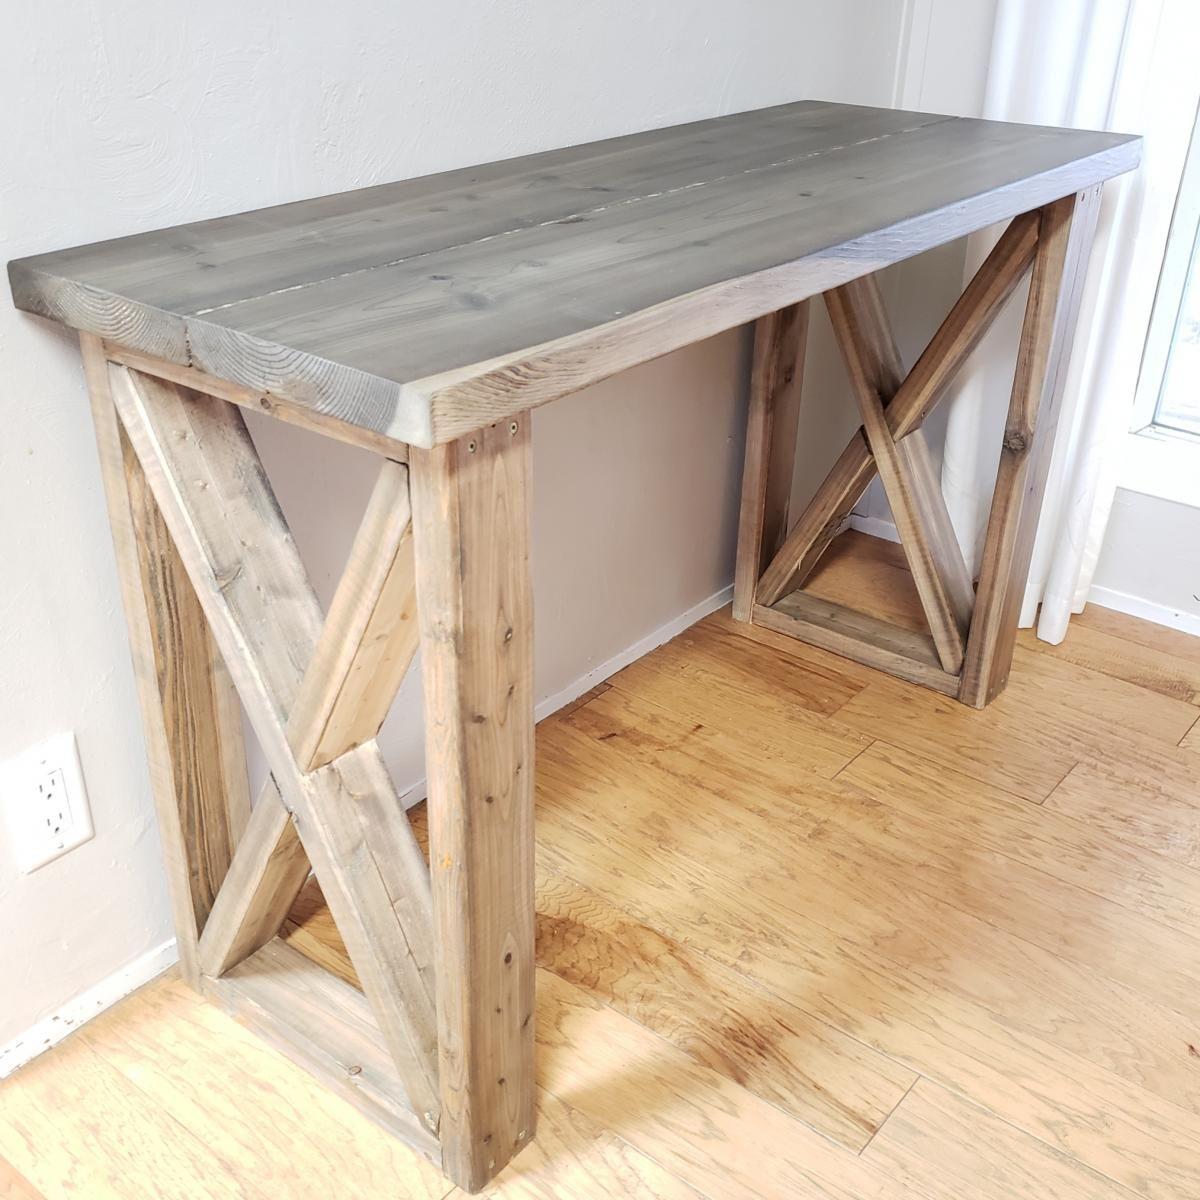 Desk Featuring X Legs Farmhouse Style Ana White In 2020 Diy Wood Desk Diy Desk Plans Homemade Desk